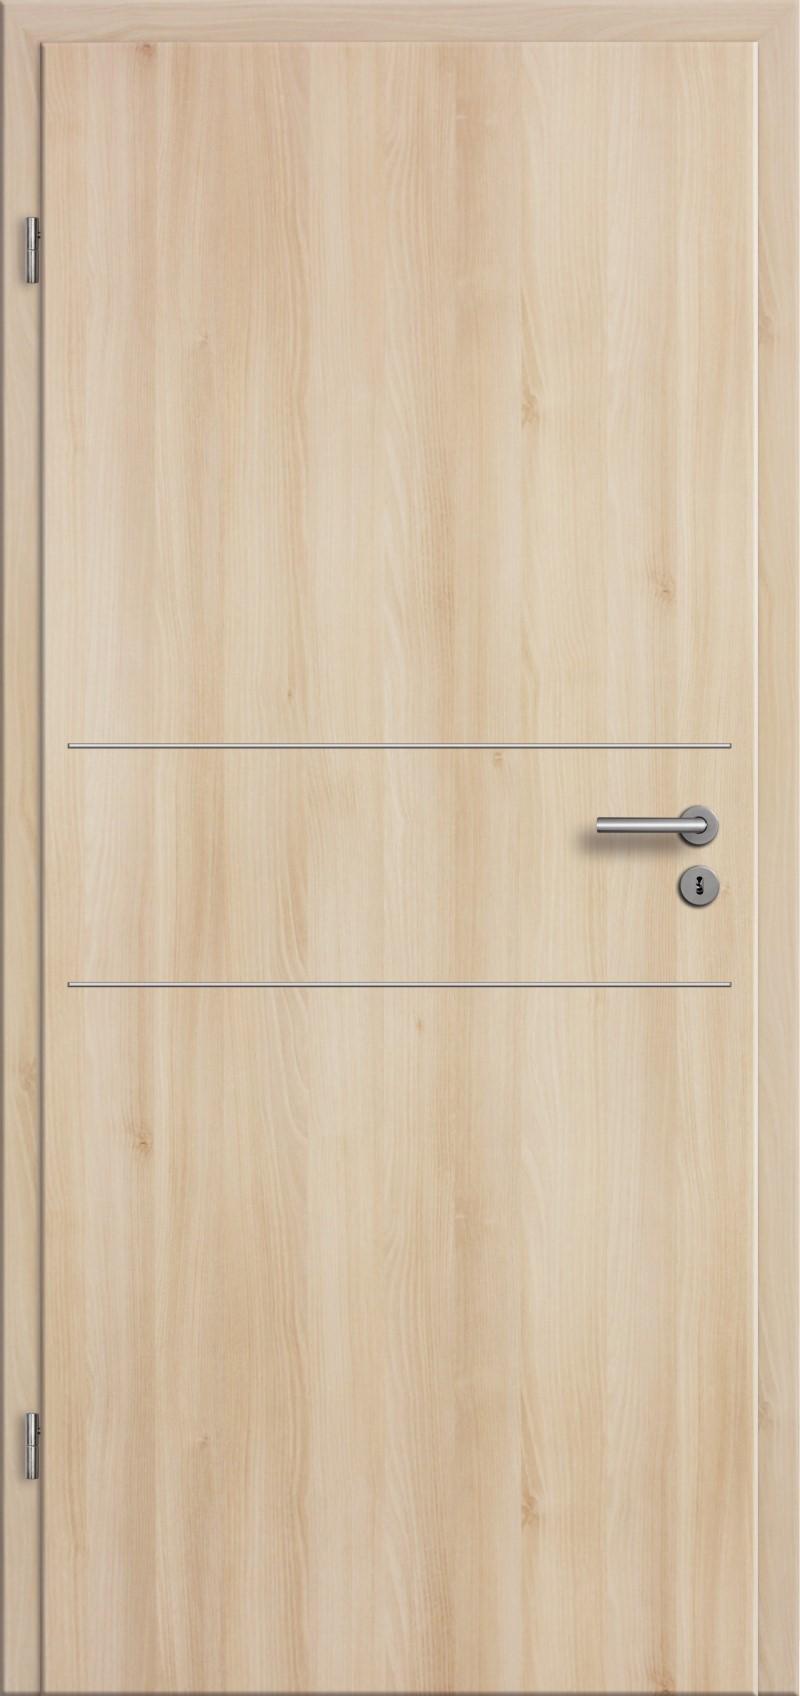 lisenent r liso l2 mit rundkante glatte cpl t ren. Black Bedroom Furniture Sets. Home Design Ideas